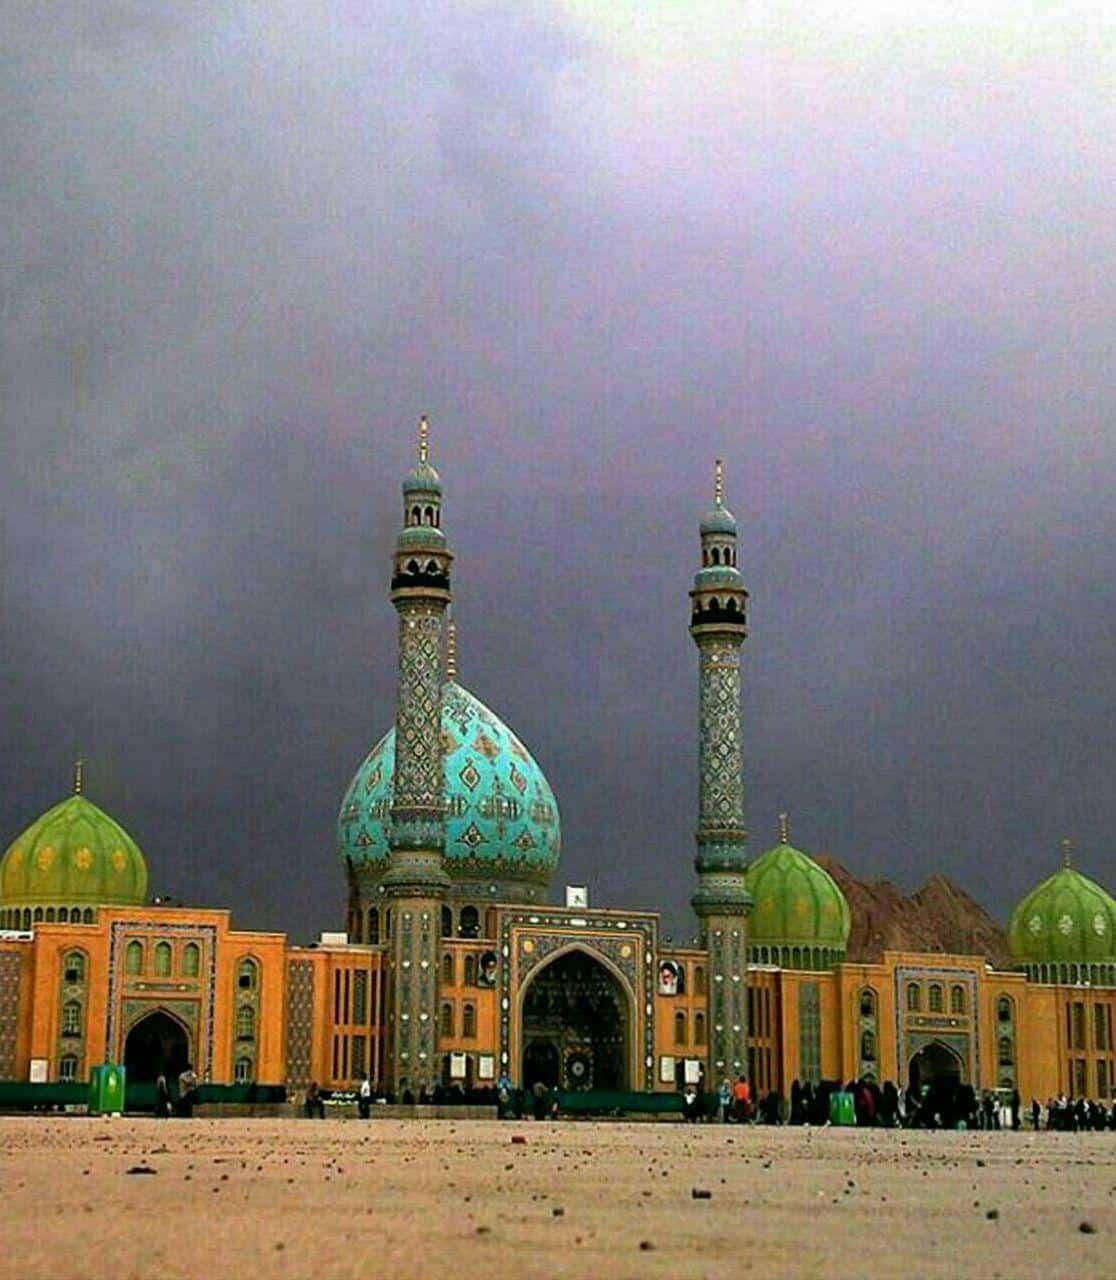 photo imam zaman hd 2. - عکس های امام زمان hd با کیفیت اچ دی